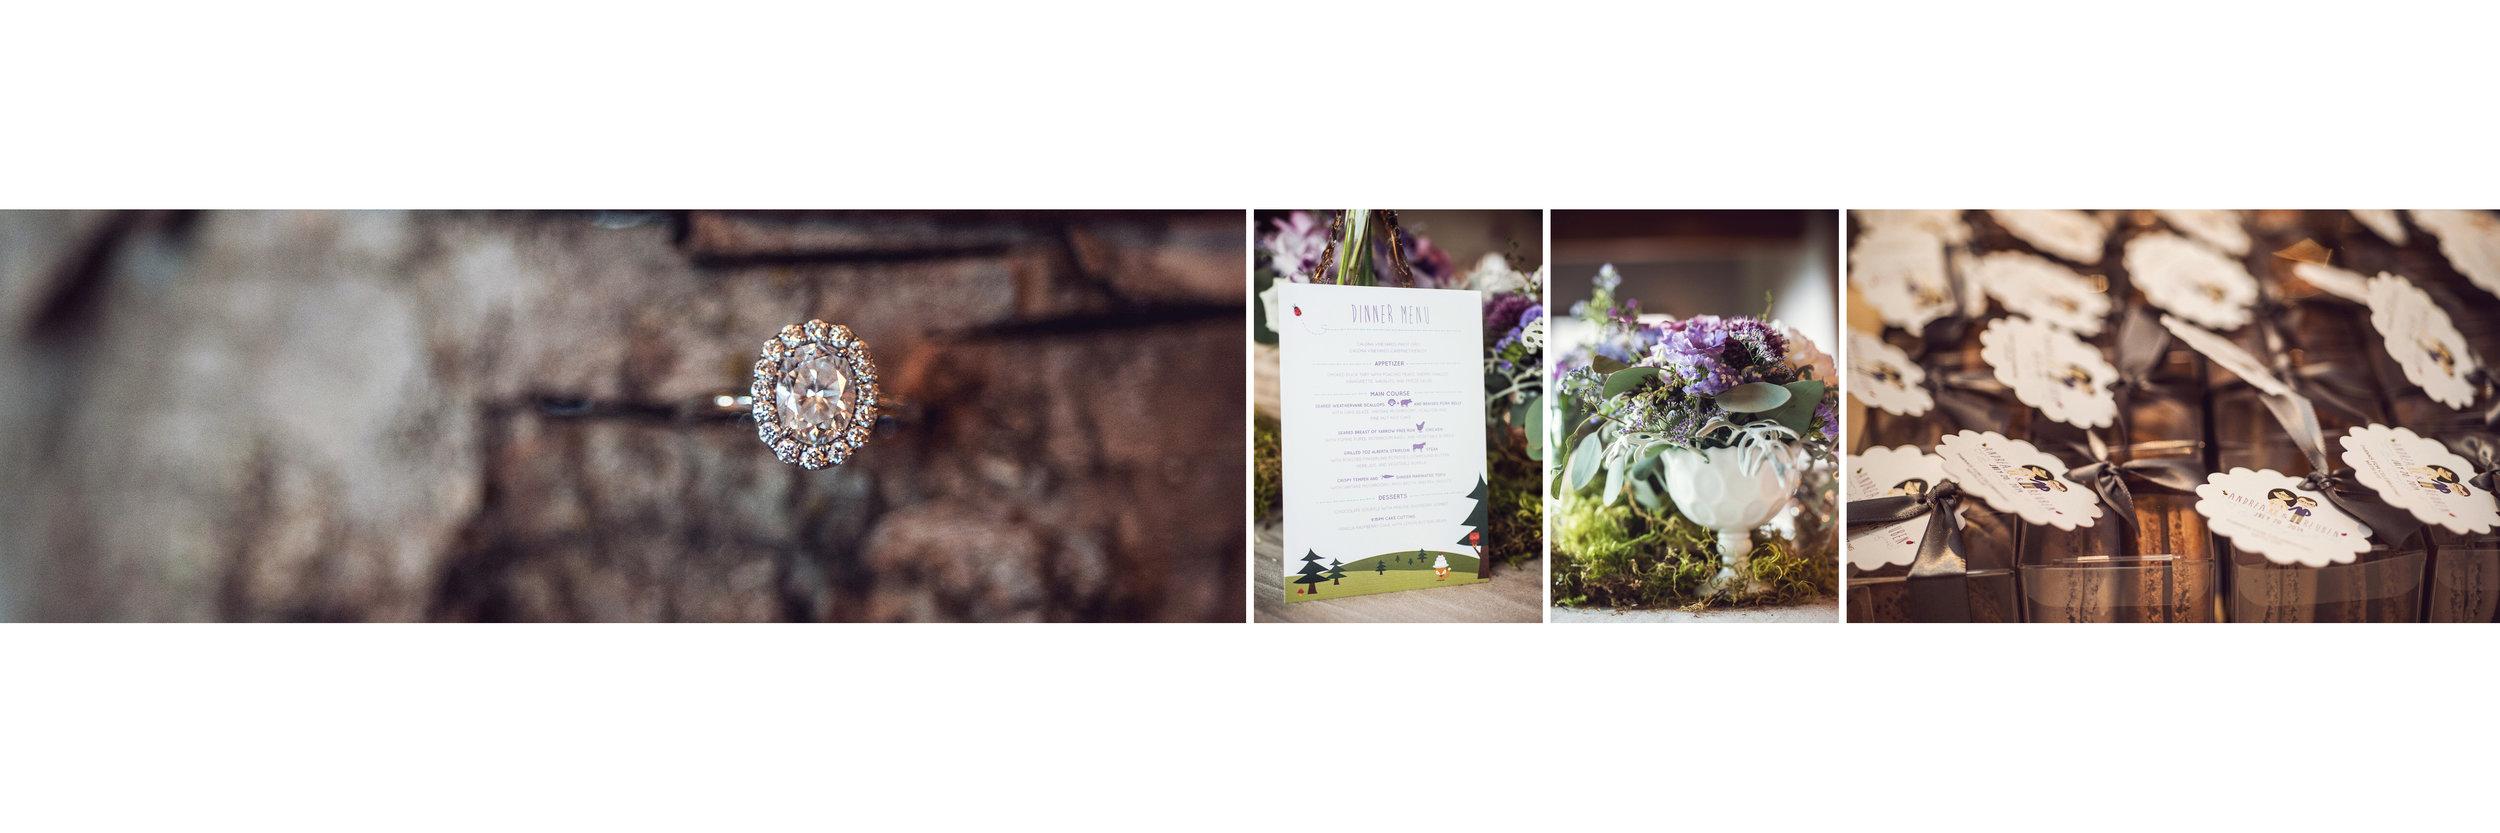 Andrea-Reuben-Grouse-Mountain-Wedding-Real-Weddings-Feature-Yaletown-Photography-014.jpg